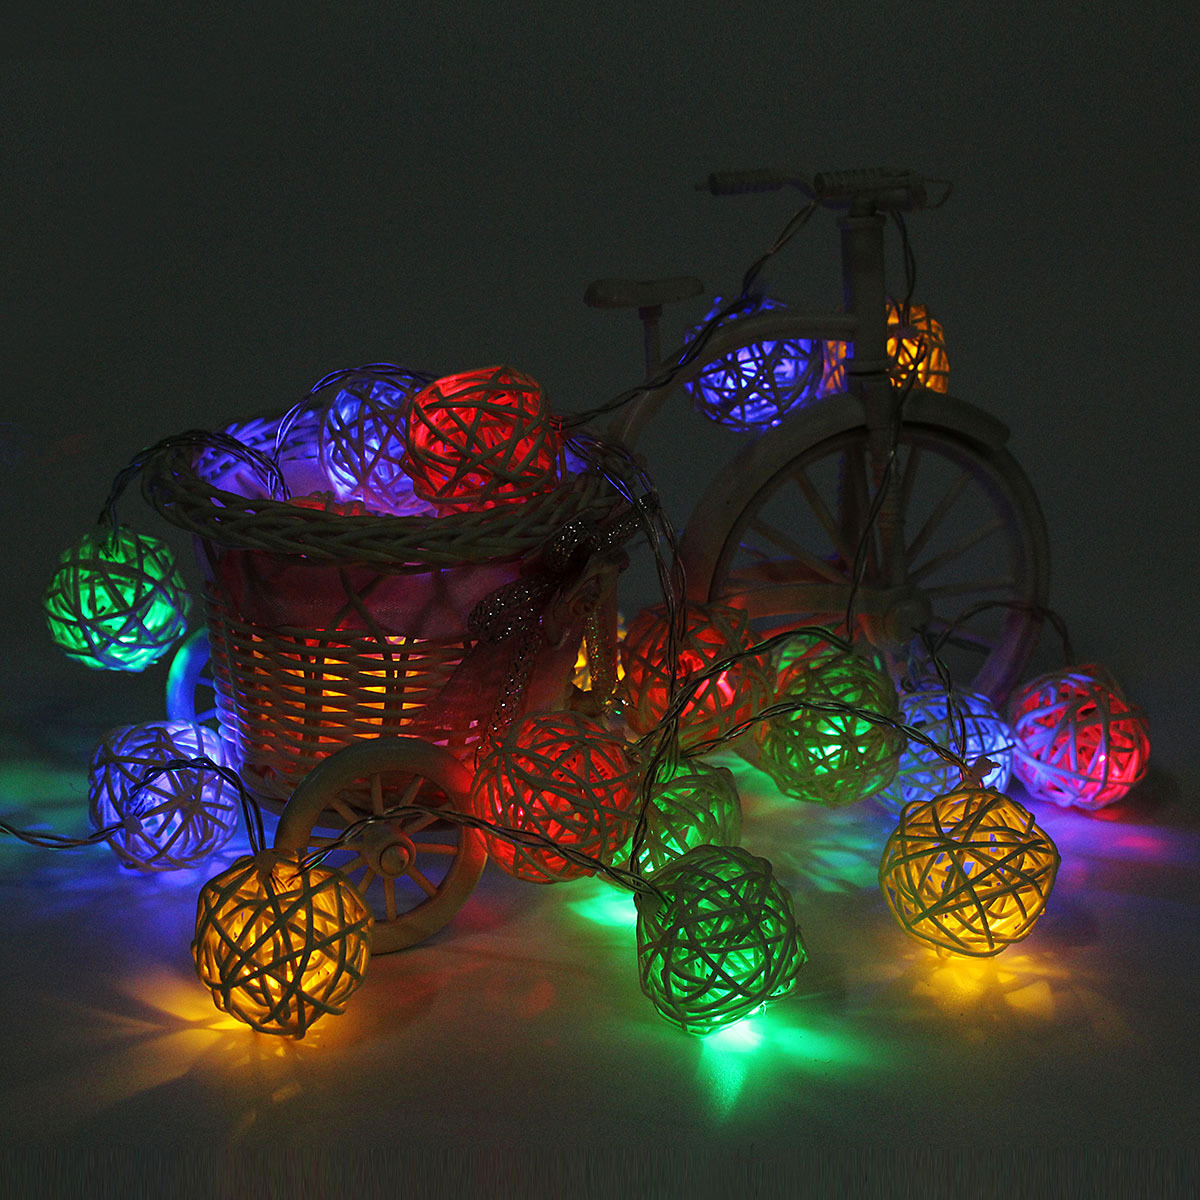 20pcs led guirlande lumineuse lampe cha ne rotin boule. Black Bedroom Furniture Sets. Home Design Ideas